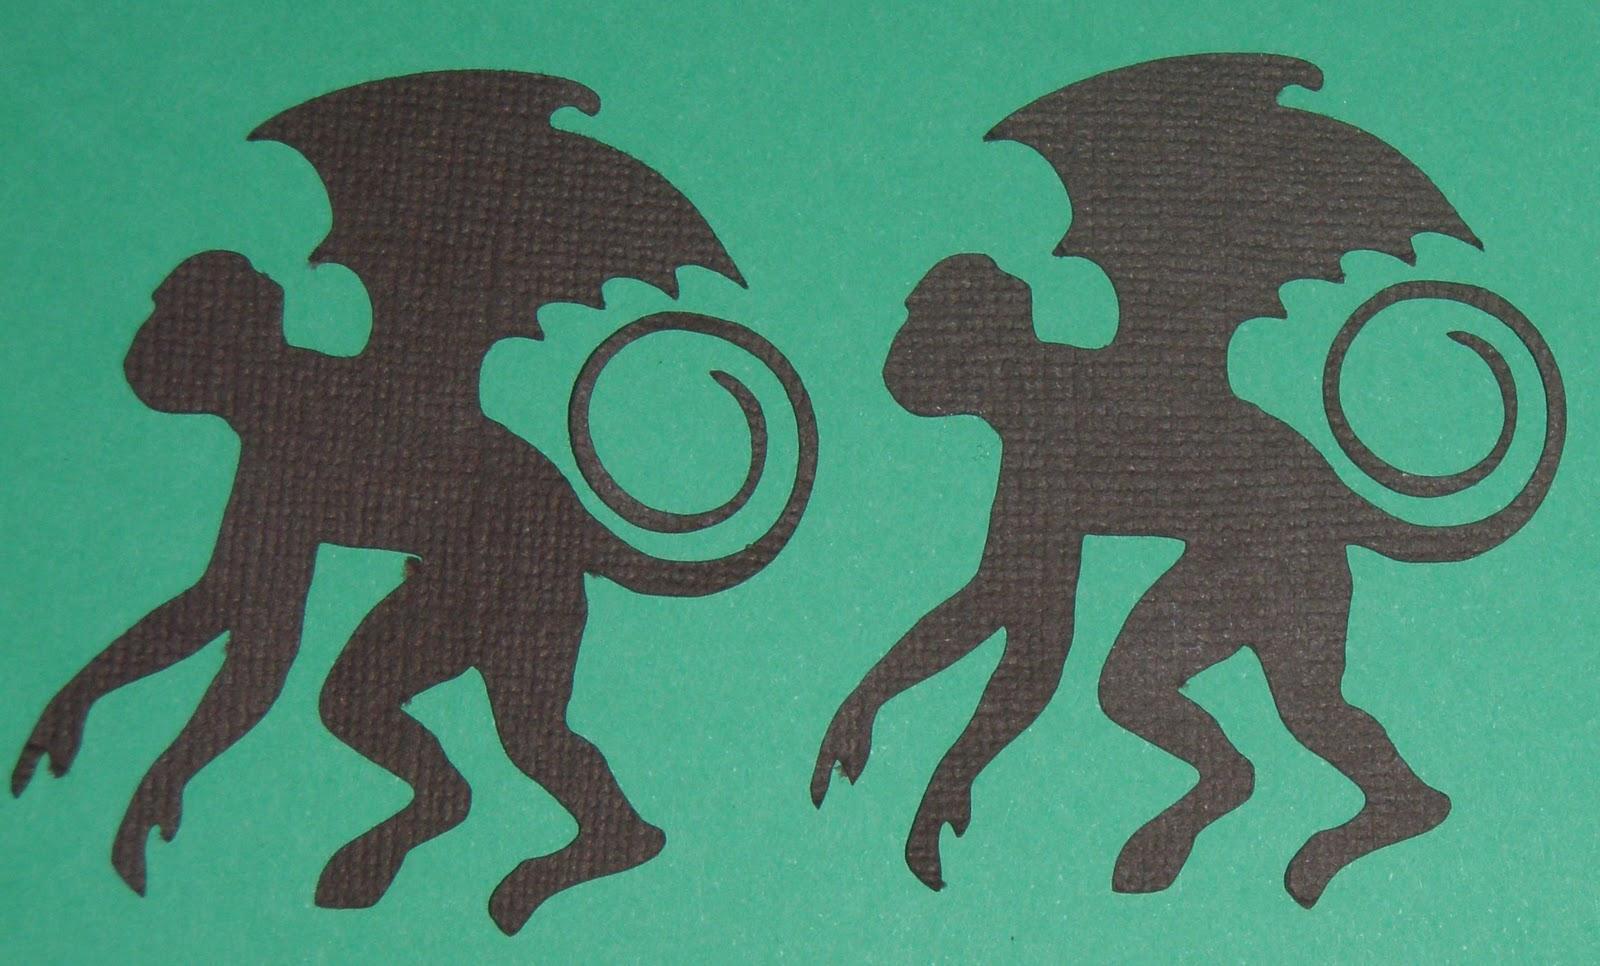 wizard of oz clipart flying monkeys #6